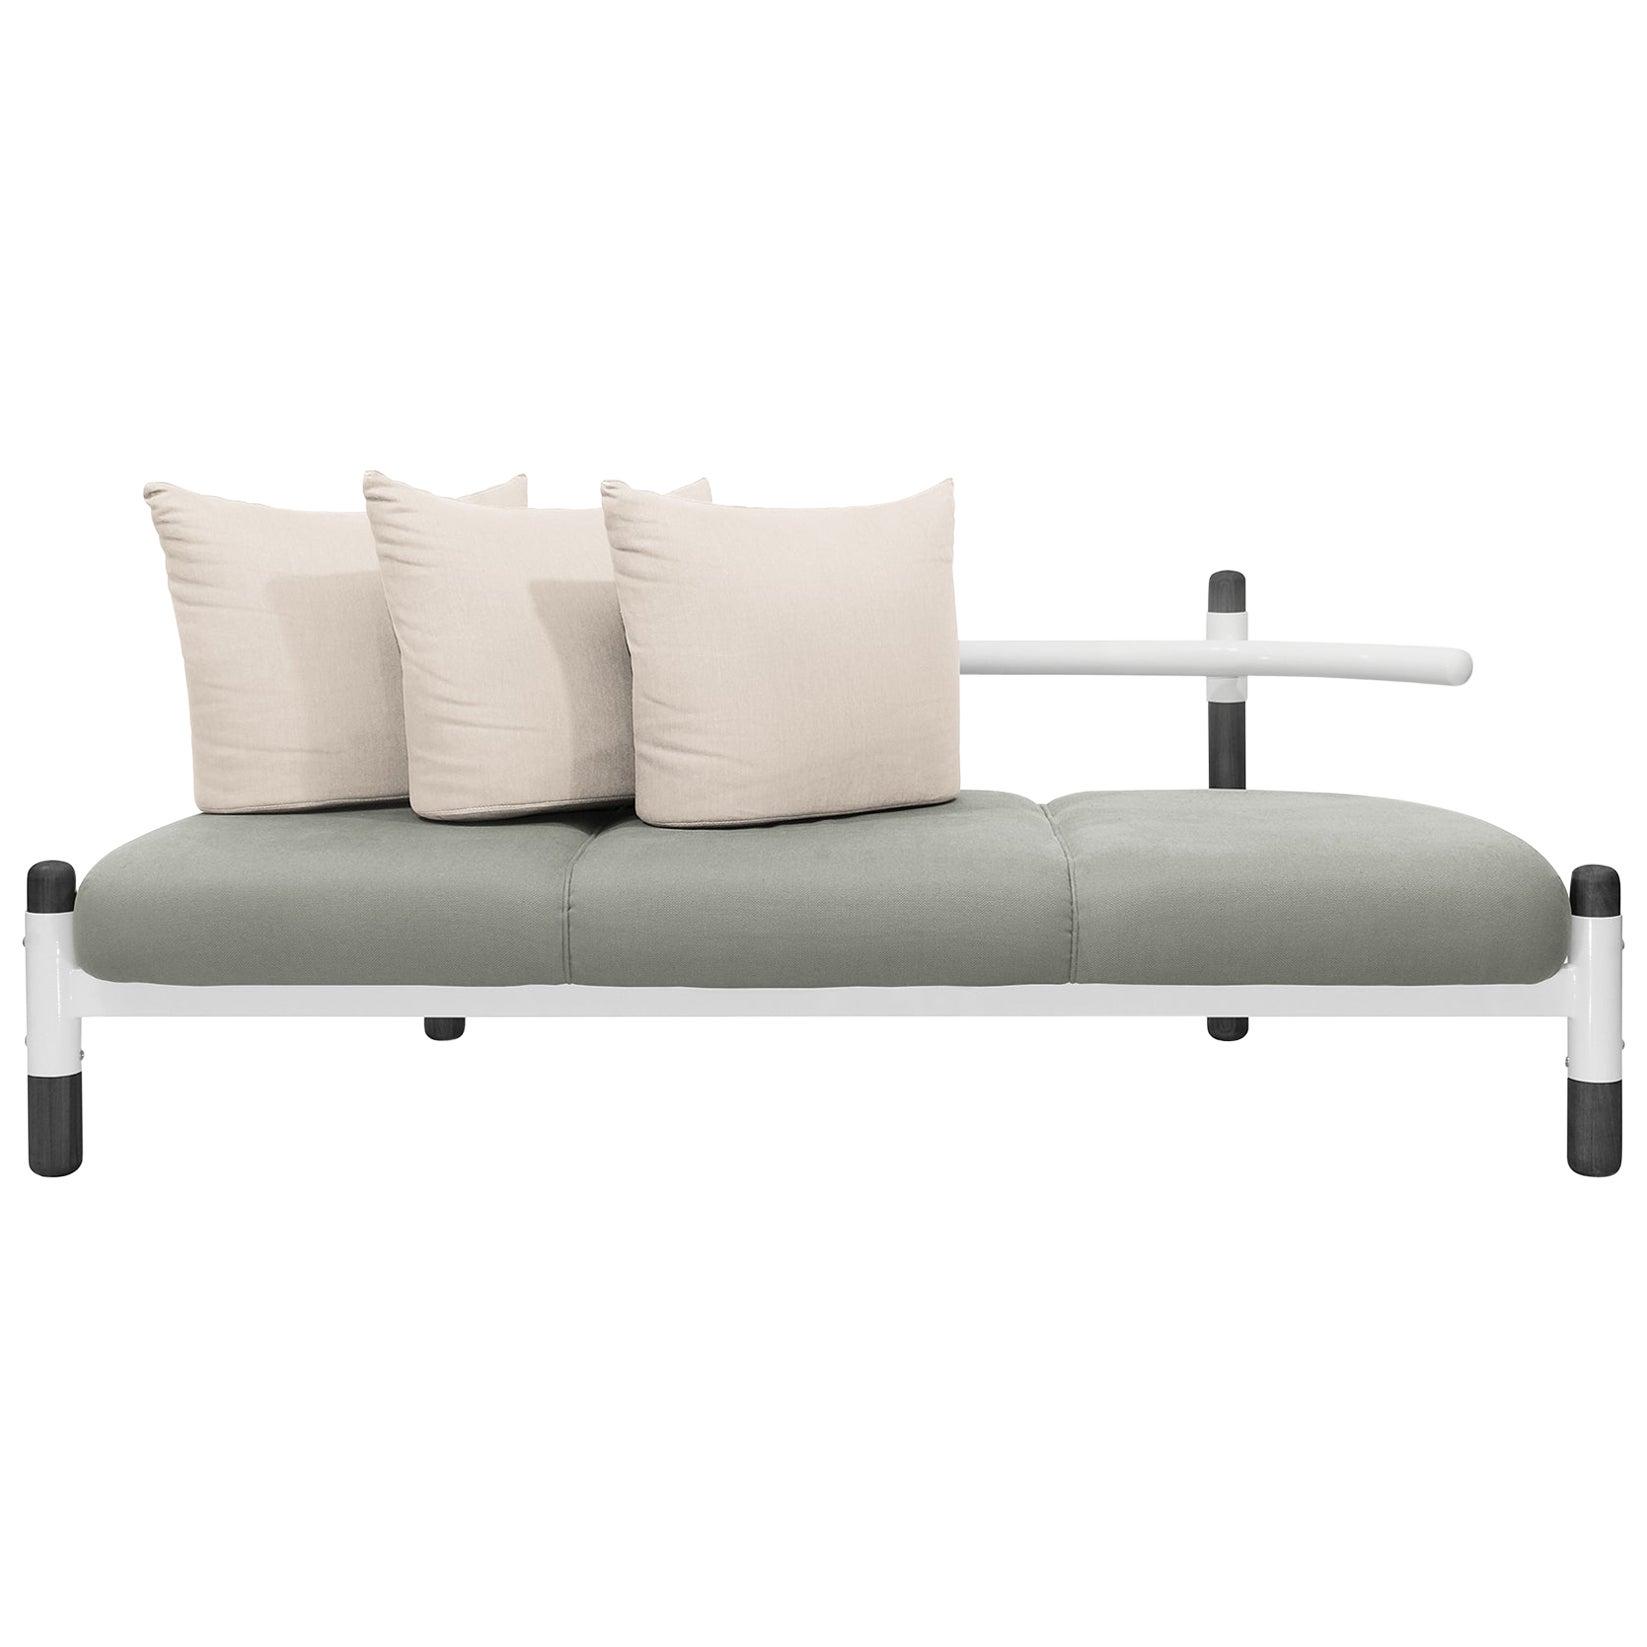 Grey PK15 Three-Seat Sofa, Steel Structure & Ebonized Wood Legs by Paulo Kobylka